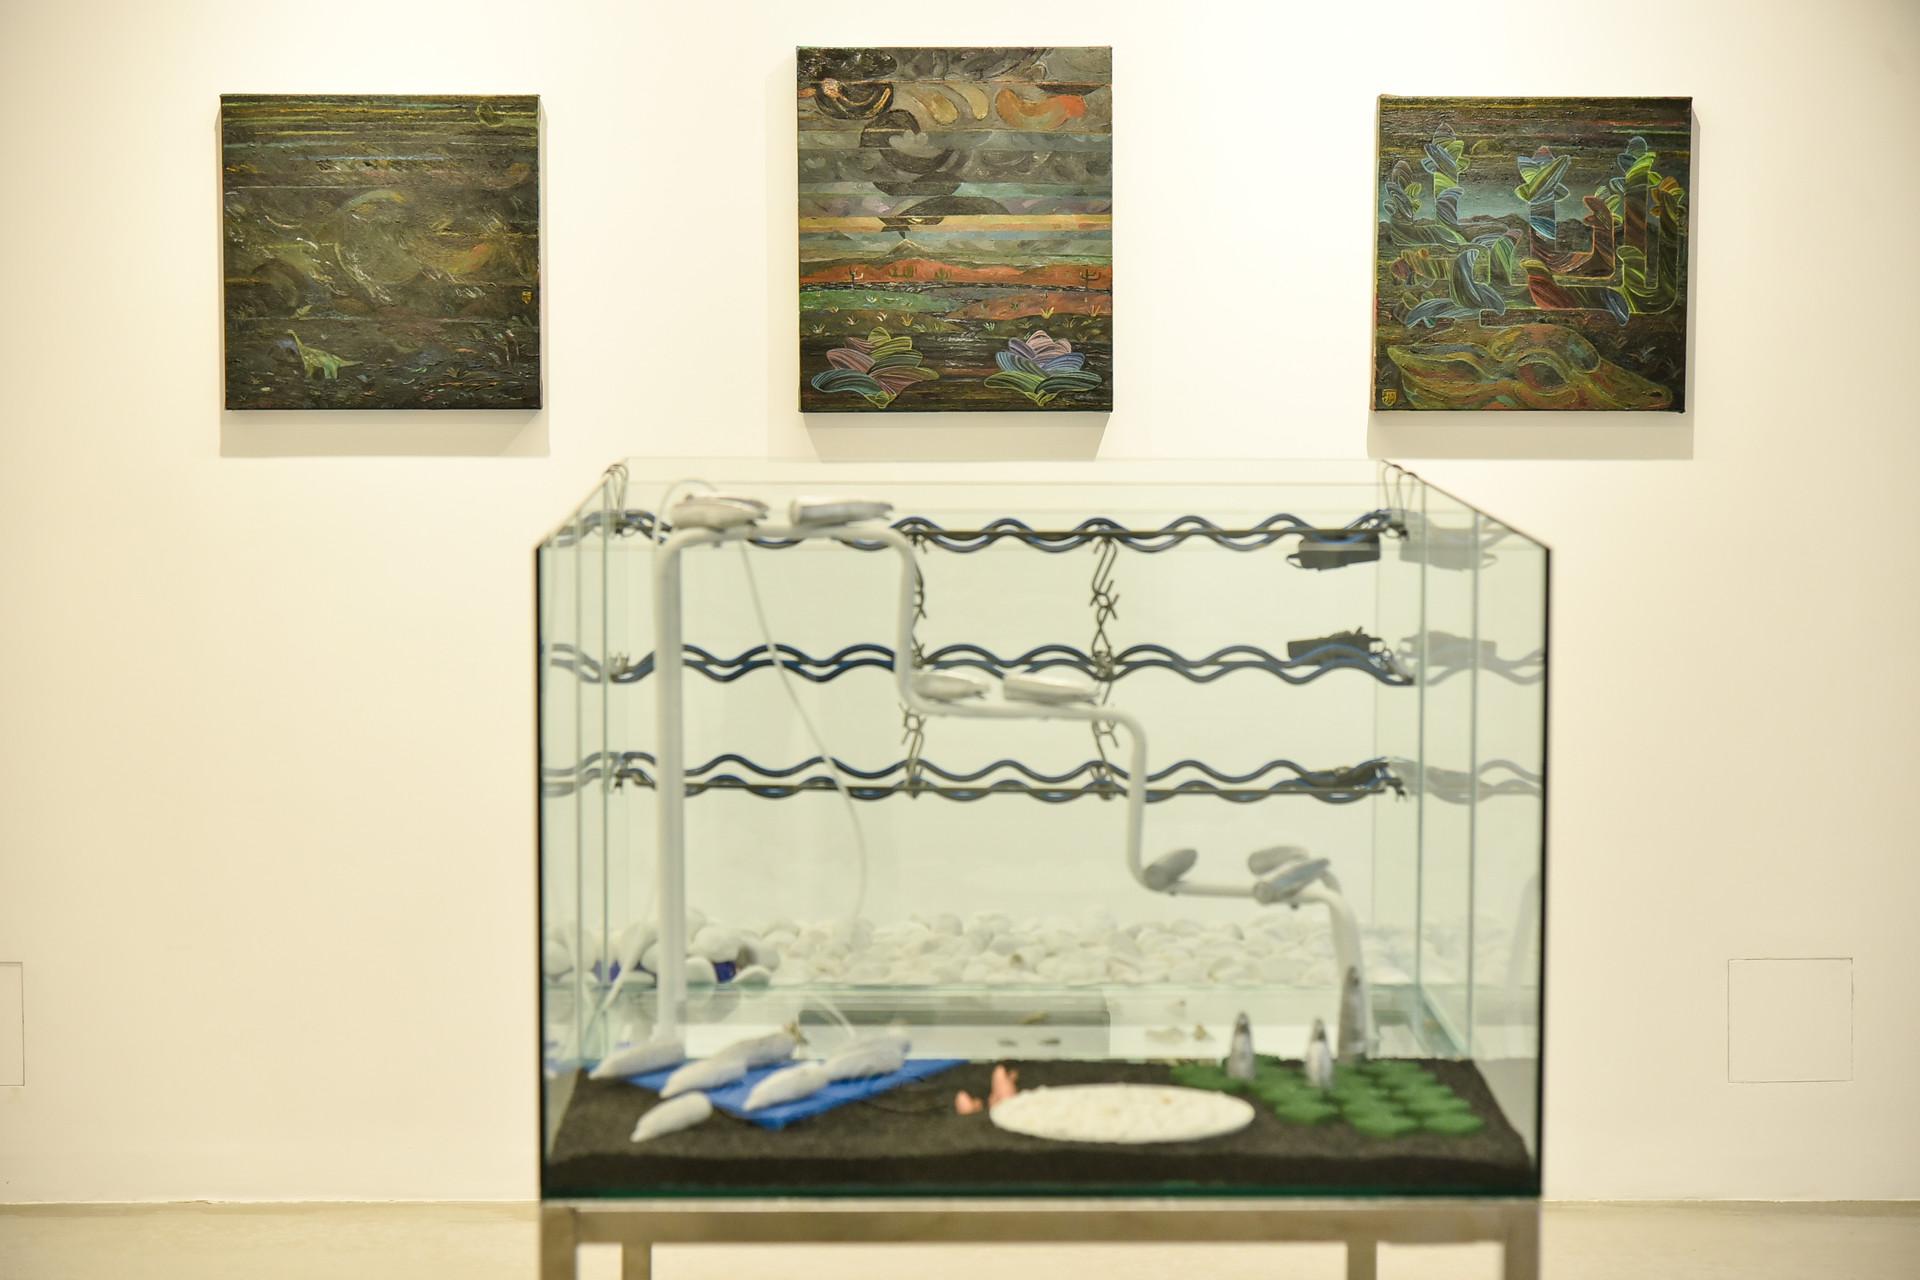 install view, Novembar Gallery (Blegrade)